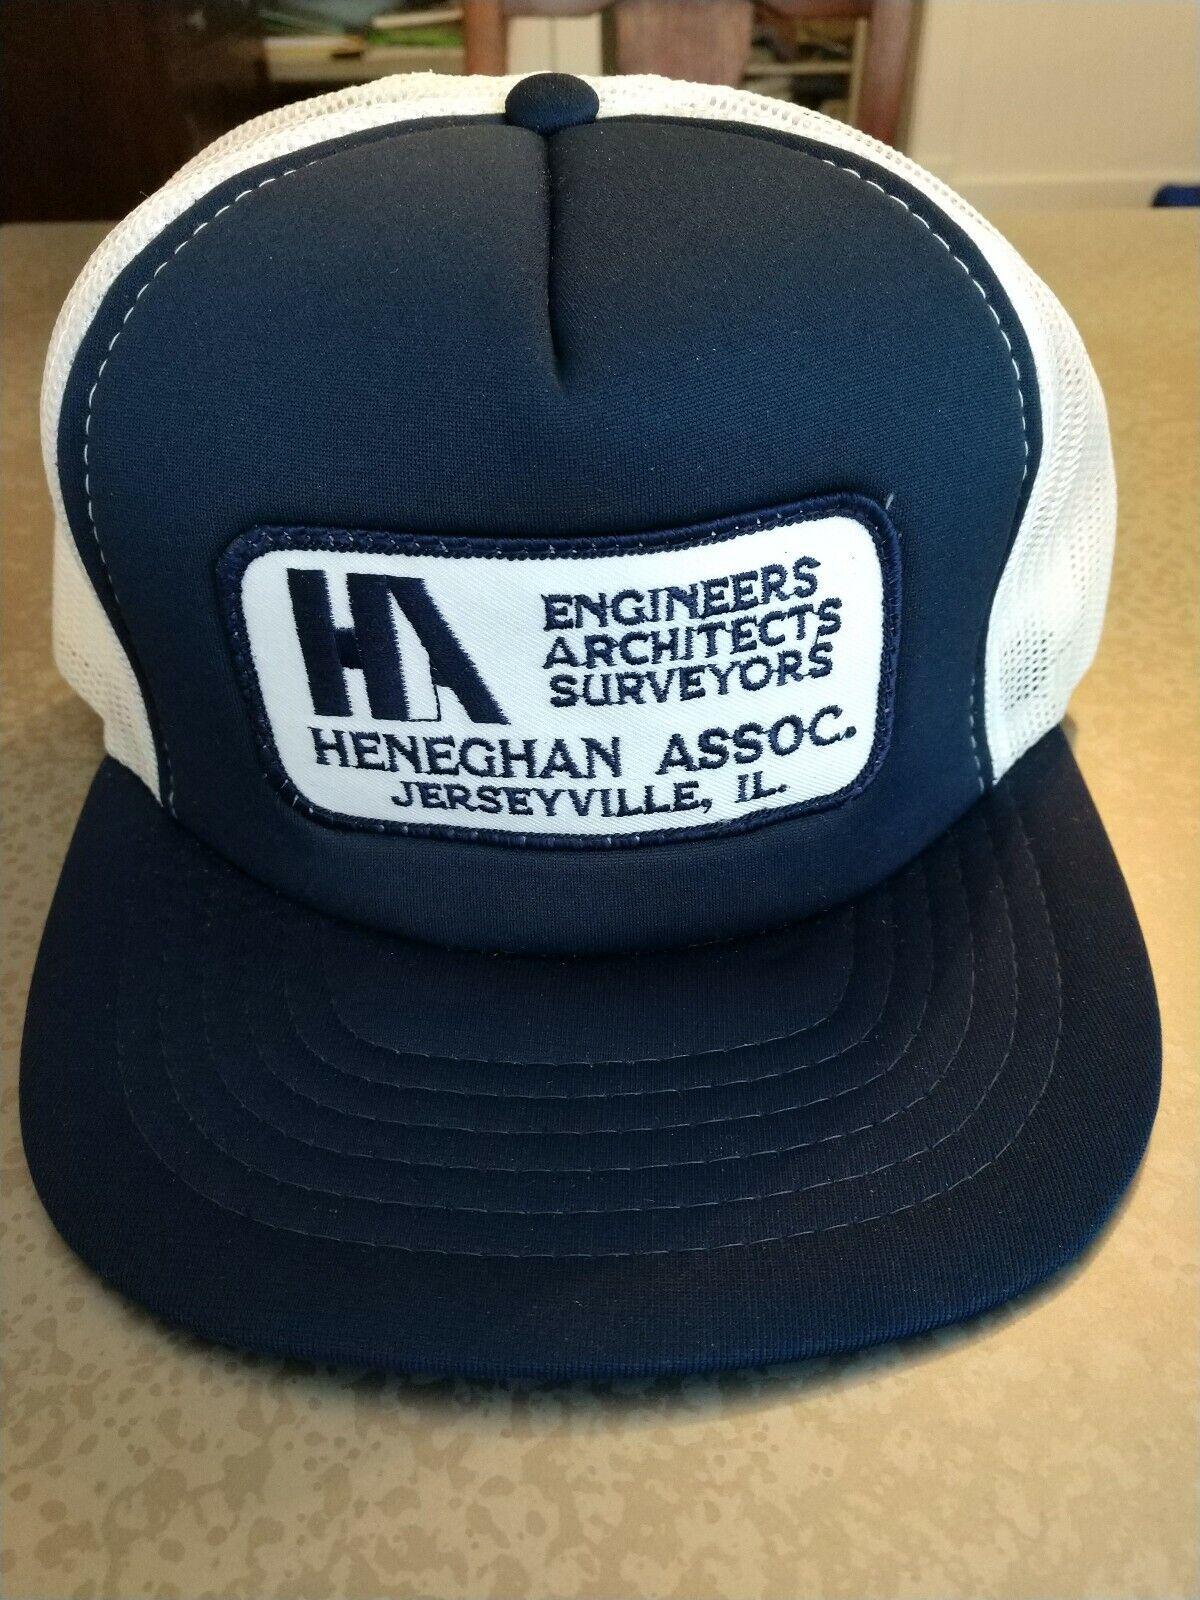 Vintage Patch Trucker hat, Heneghan Assoc., Cardinal Cap, like new